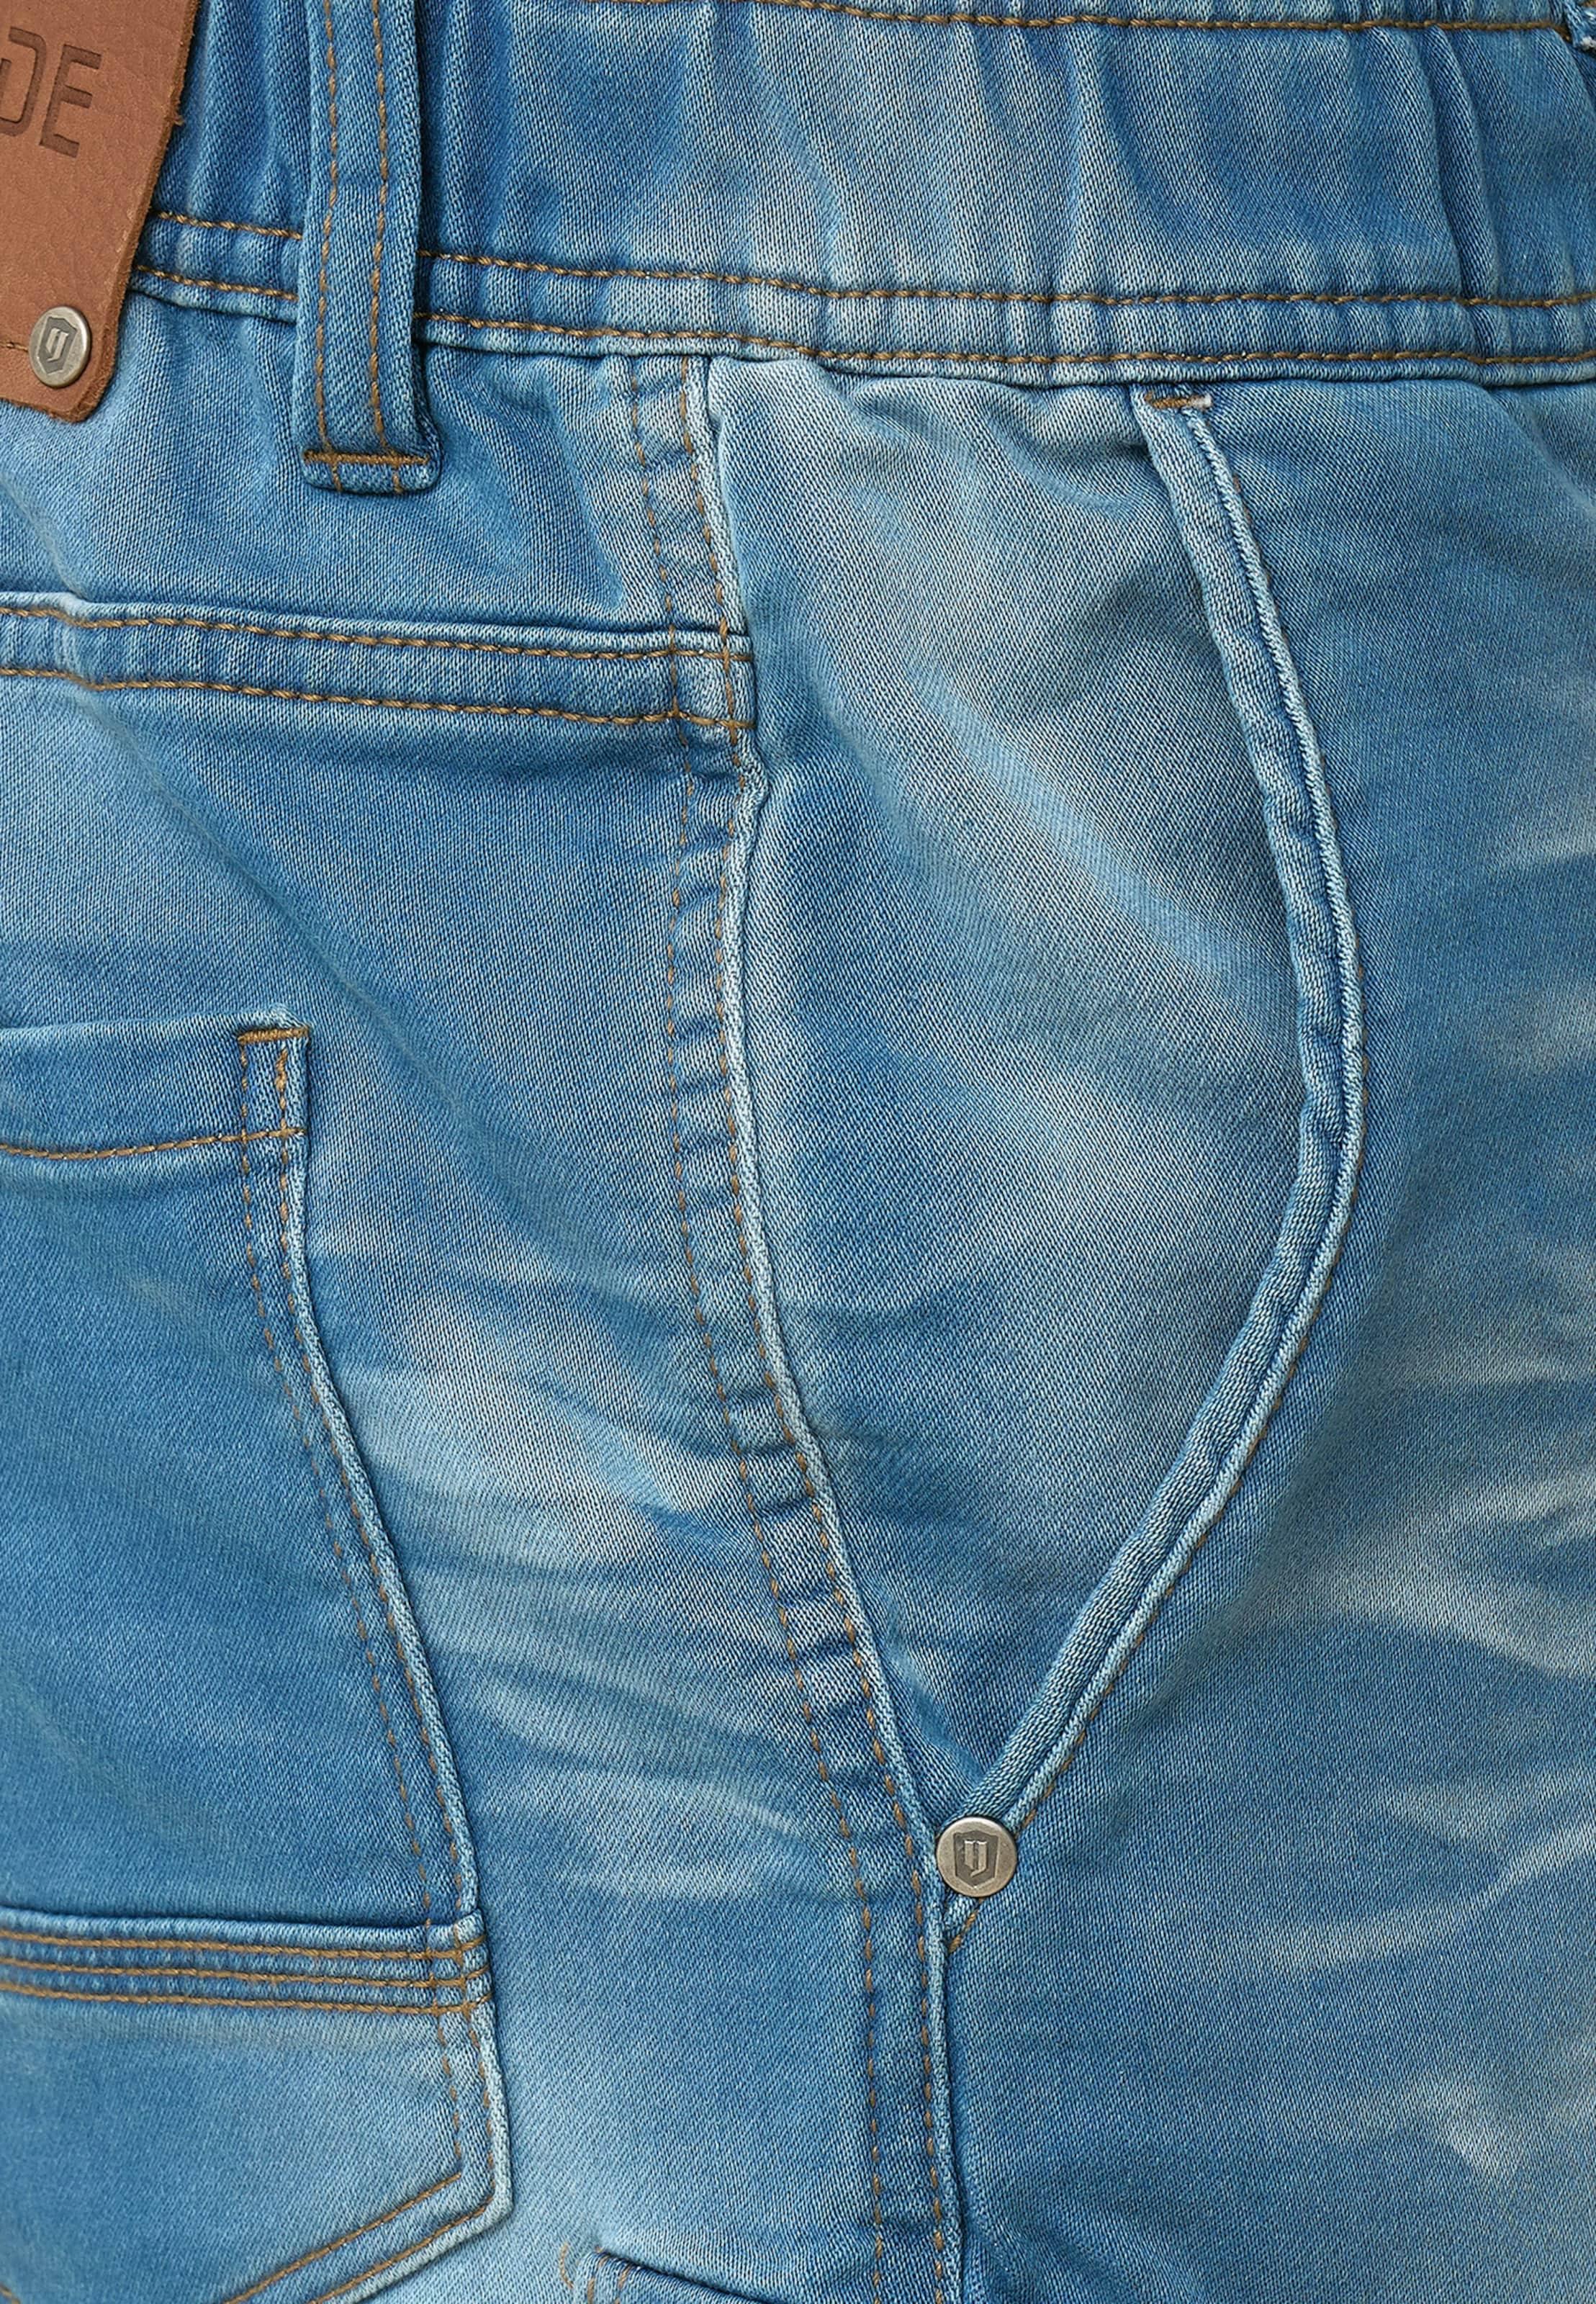 Indicode 'chandos' In Denim Blue Shorts Jeans y8PmNv0Own